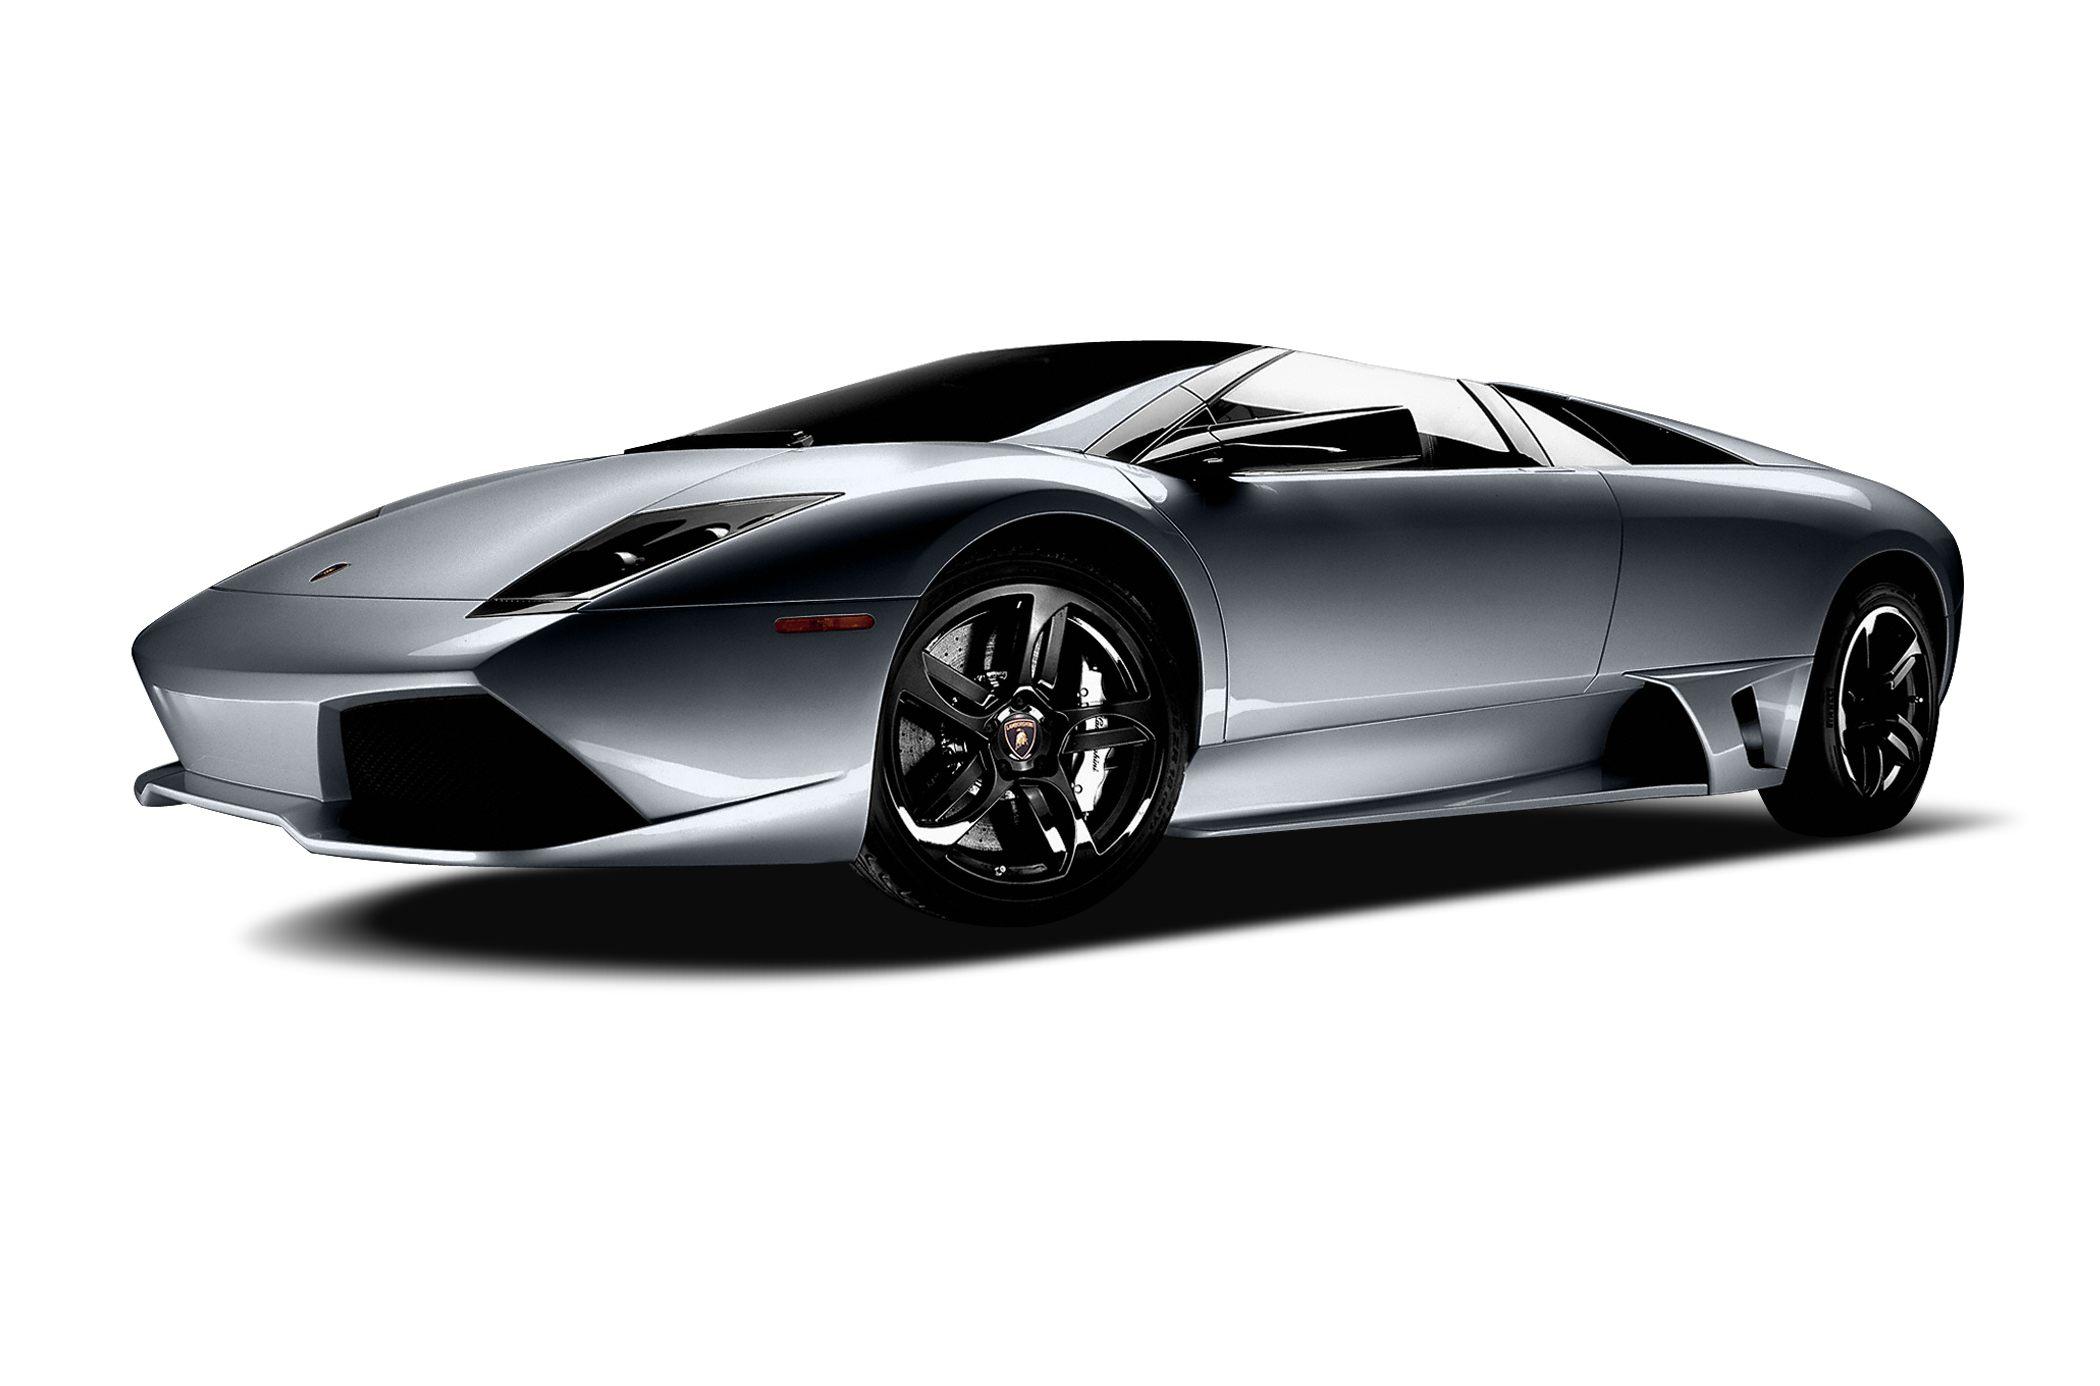 2008 Lamborghini Murcielago Lp640 2dr Roadster Pricing And Options